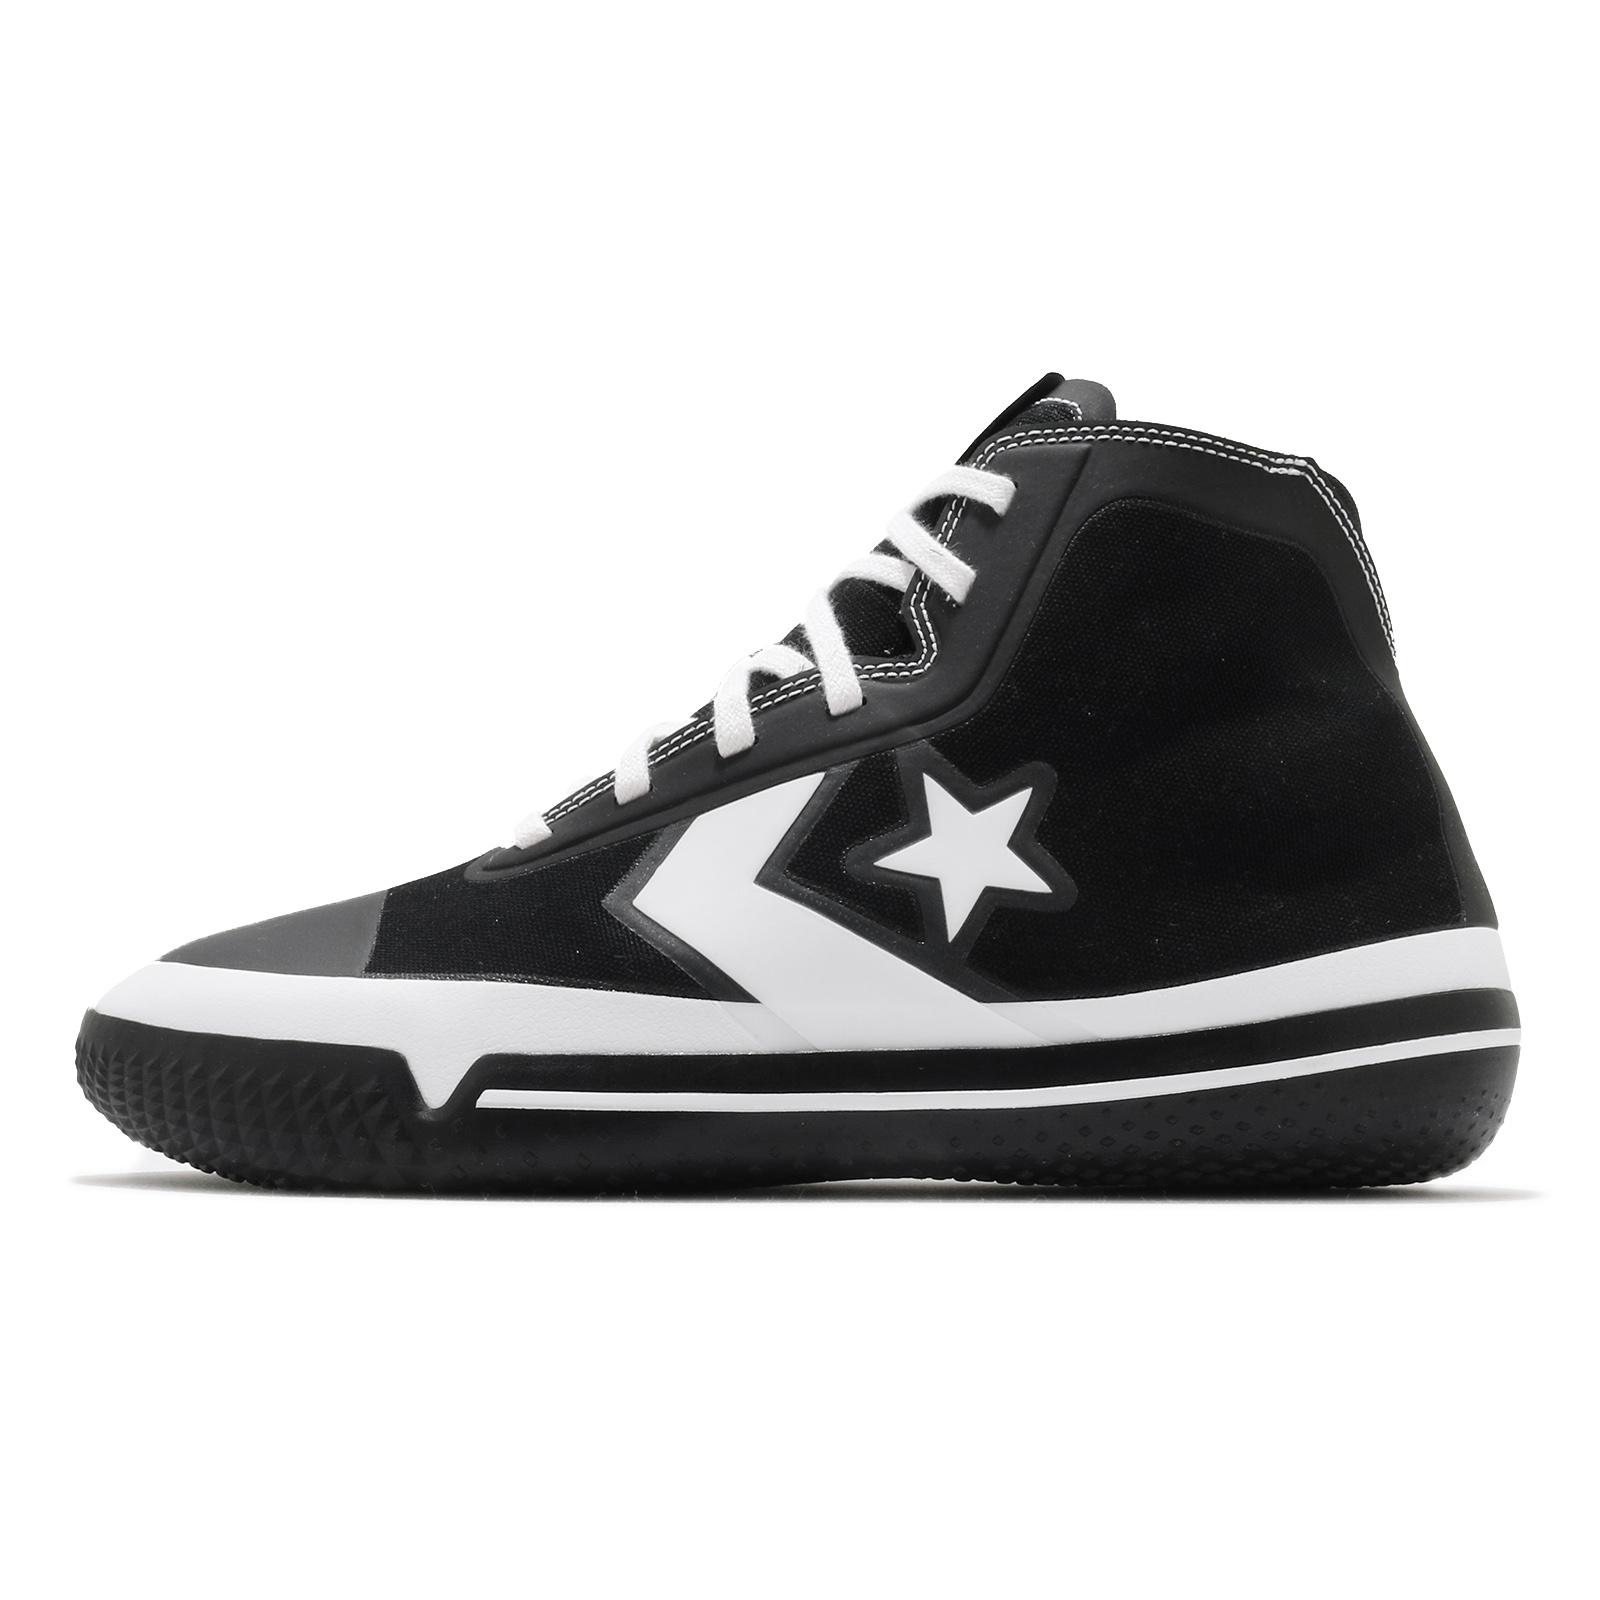 Converse 籃球鞋 All Star Pro BB Hi 黑 白 Chuck Taylor 男鞋 170423C